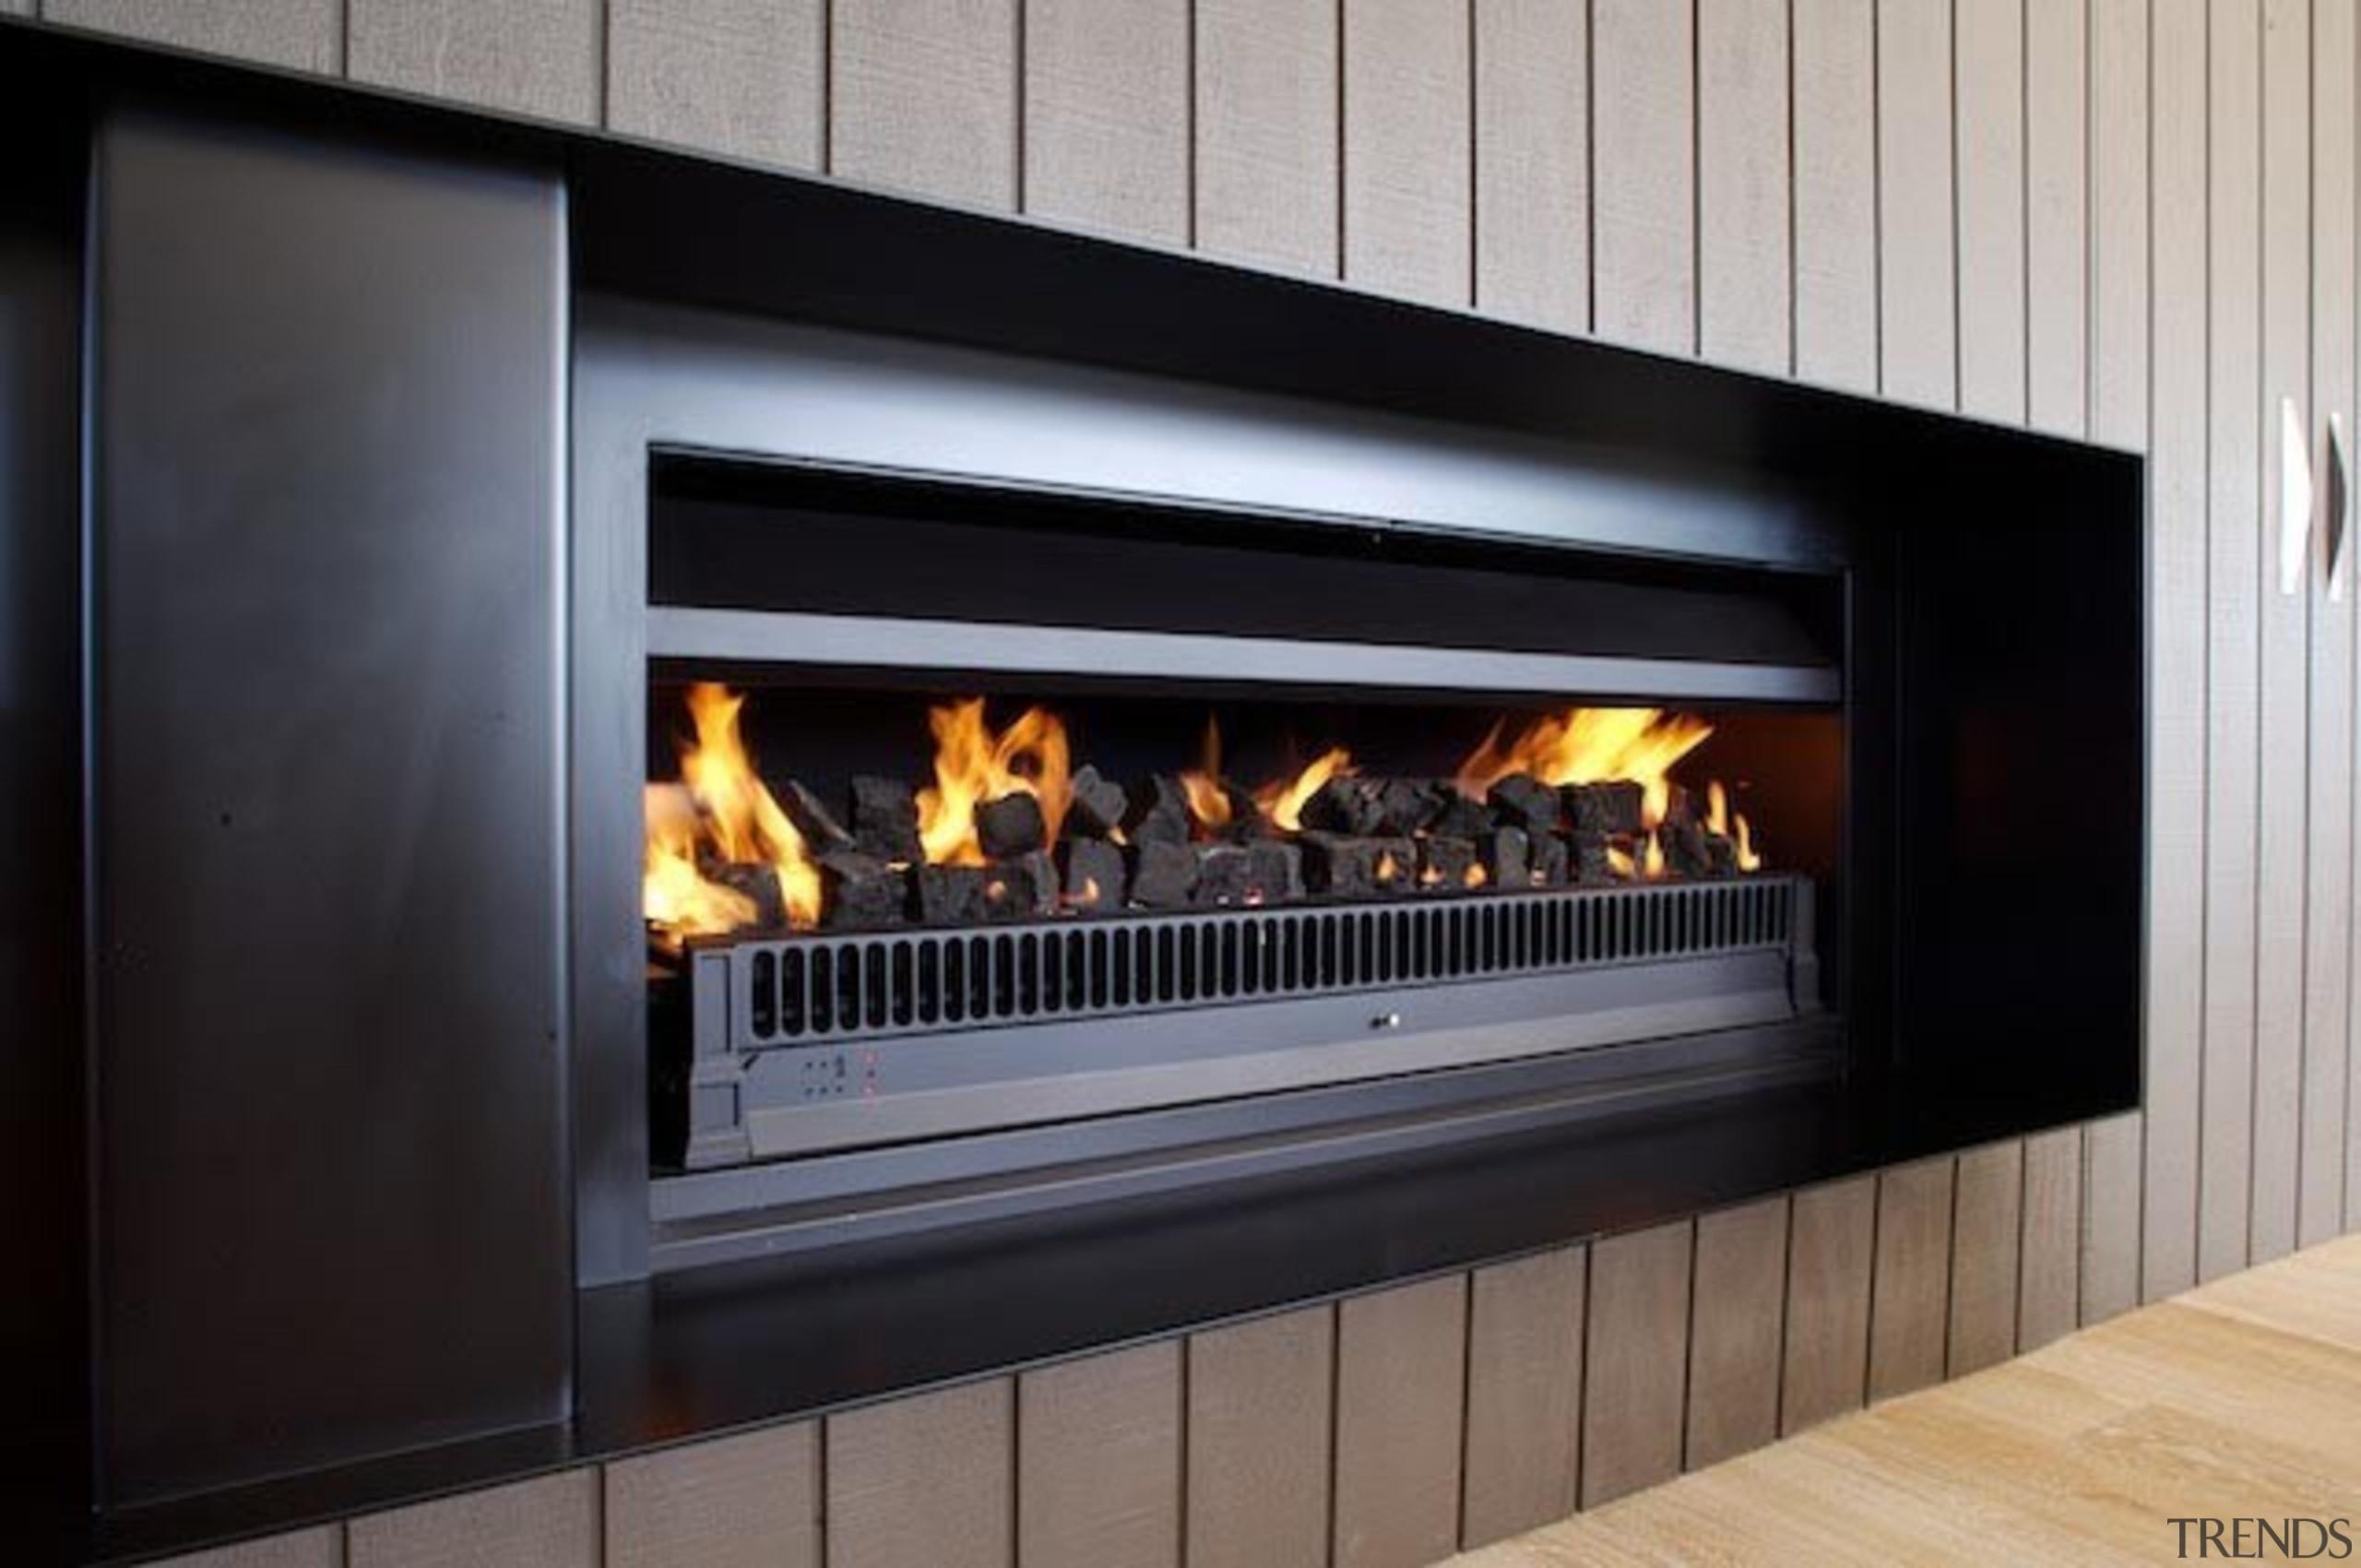 Electronic Gas 1500 - Electronic Gas 1500 - fireplace, hearth, heat, wood burning stove, black, gray